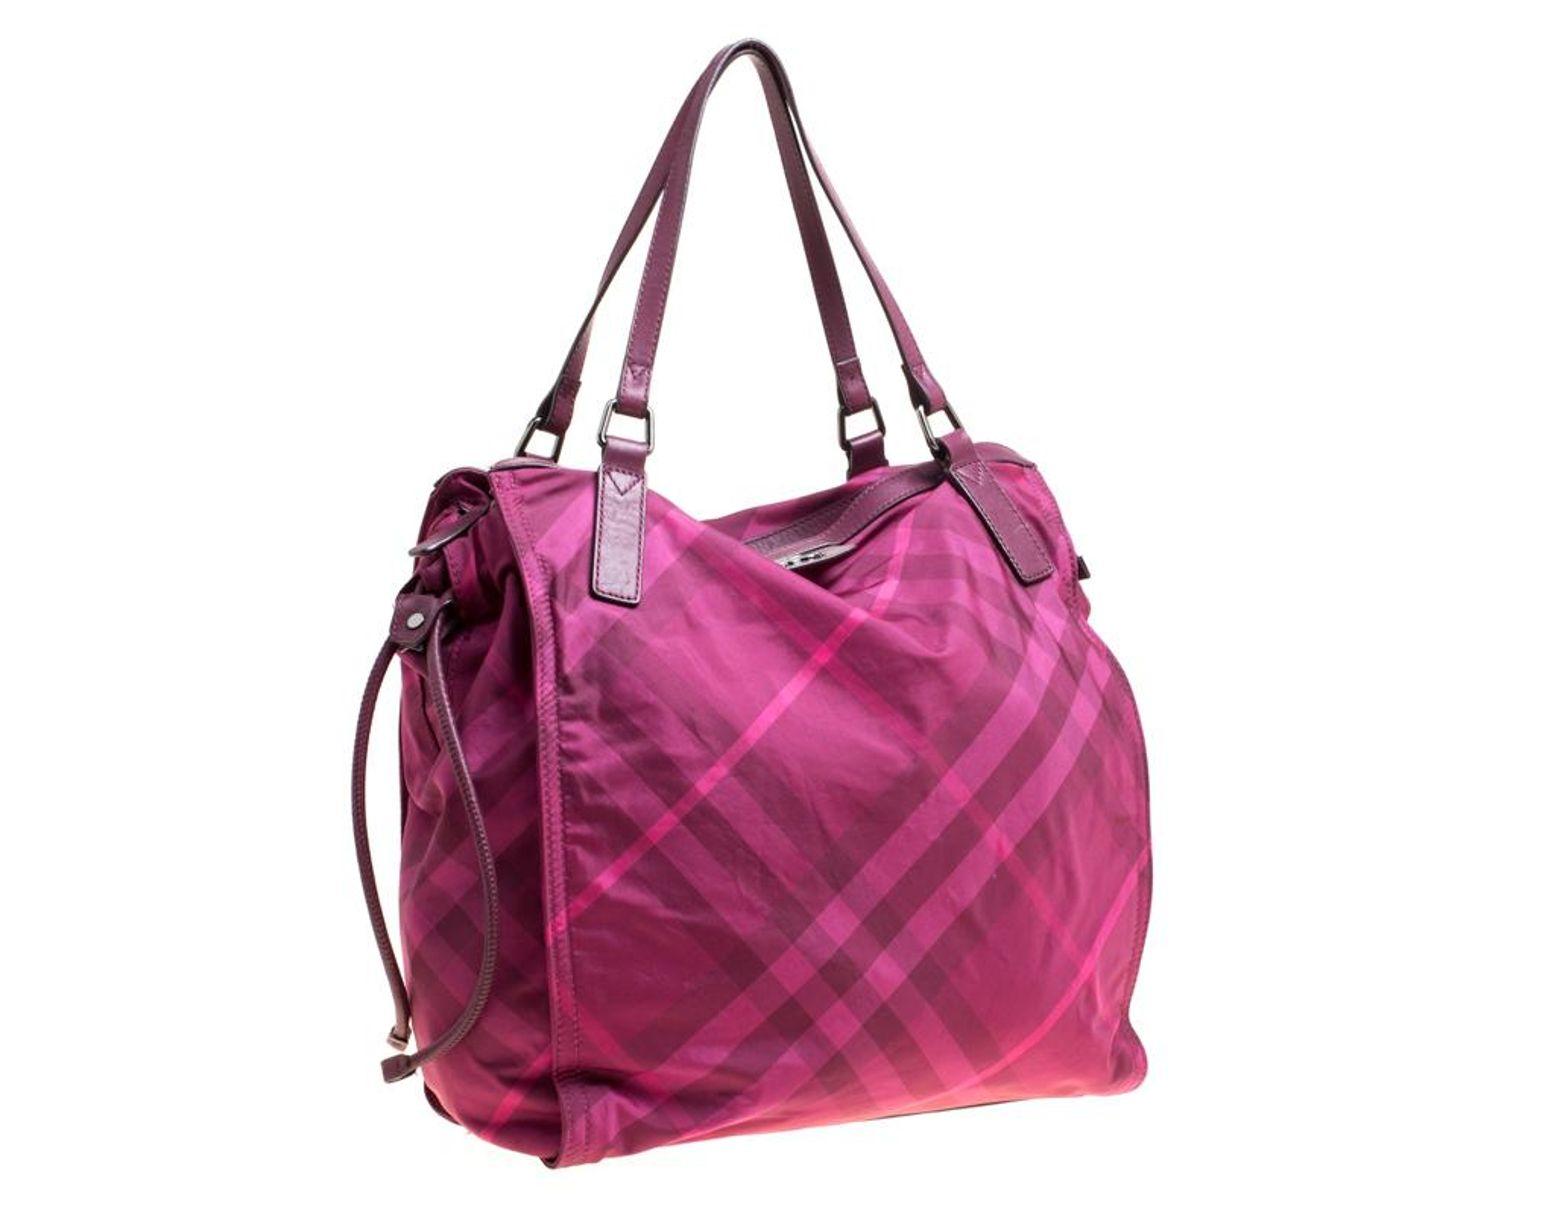 e9c55aaf7a1f Lyst - Burberry Hot Pink Nova Check Nylon Tote in Pink